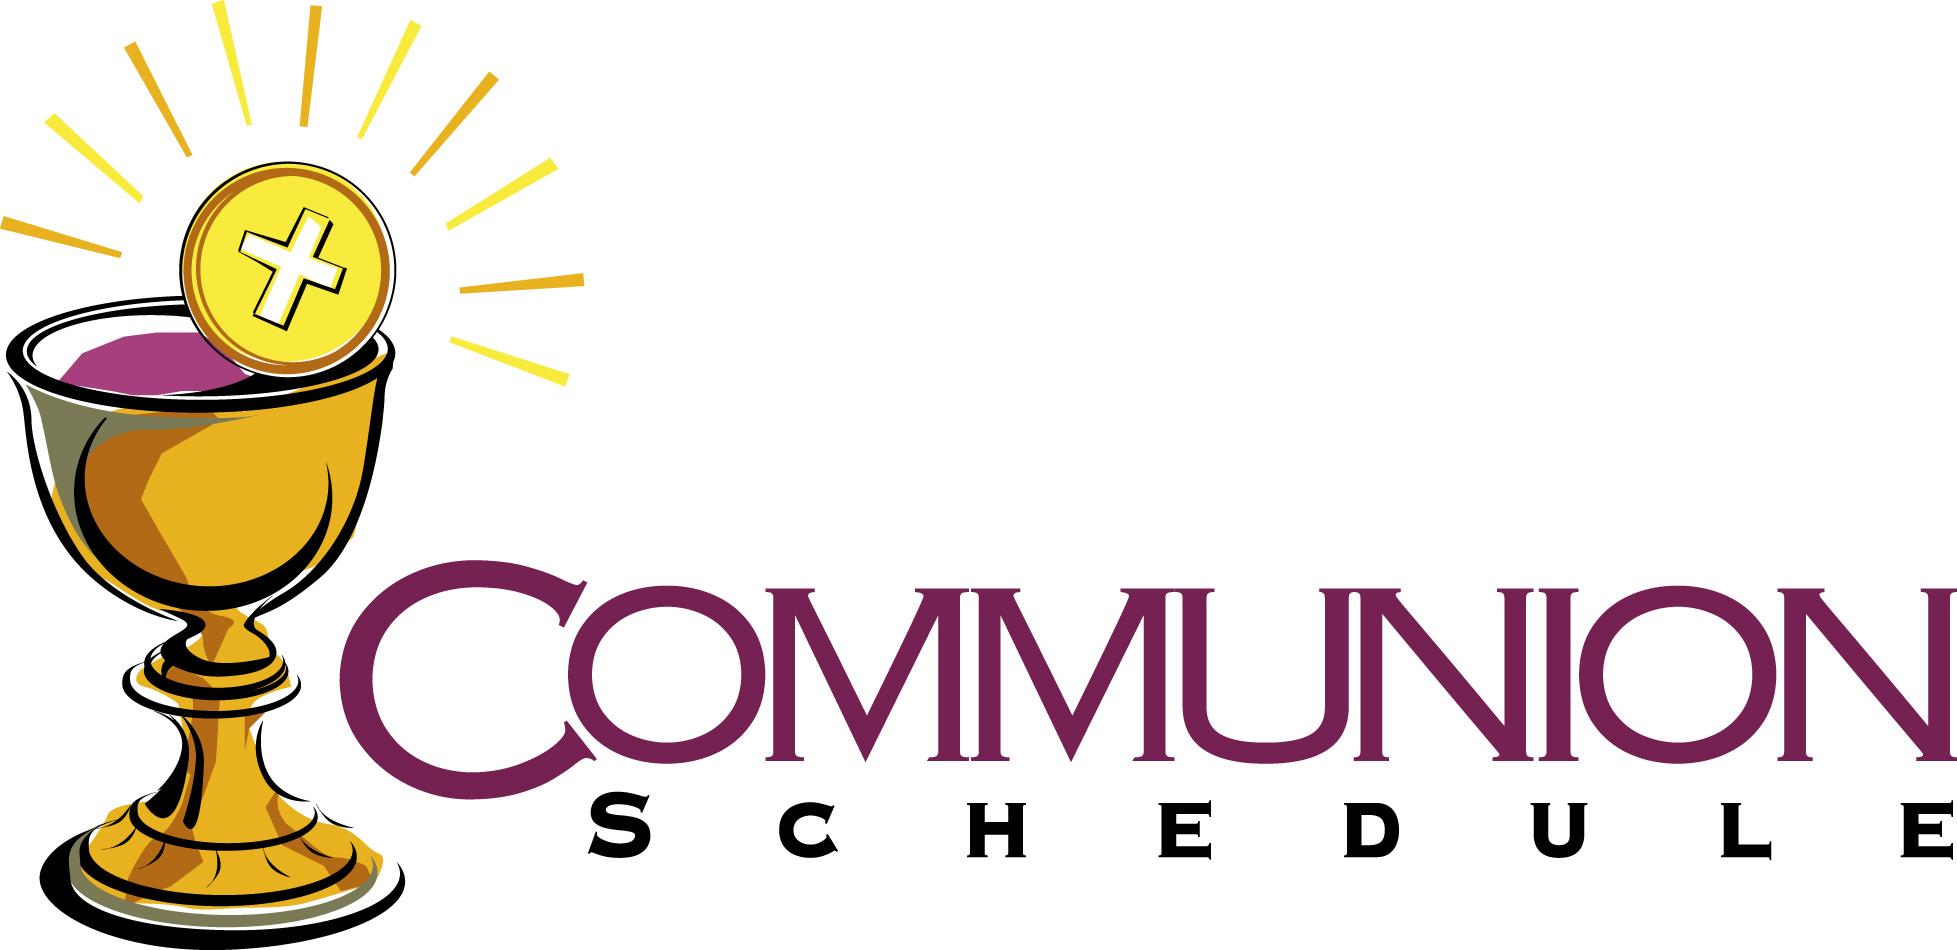 First Communion Clip Art #3304-First Communion Clip Art #3304-13